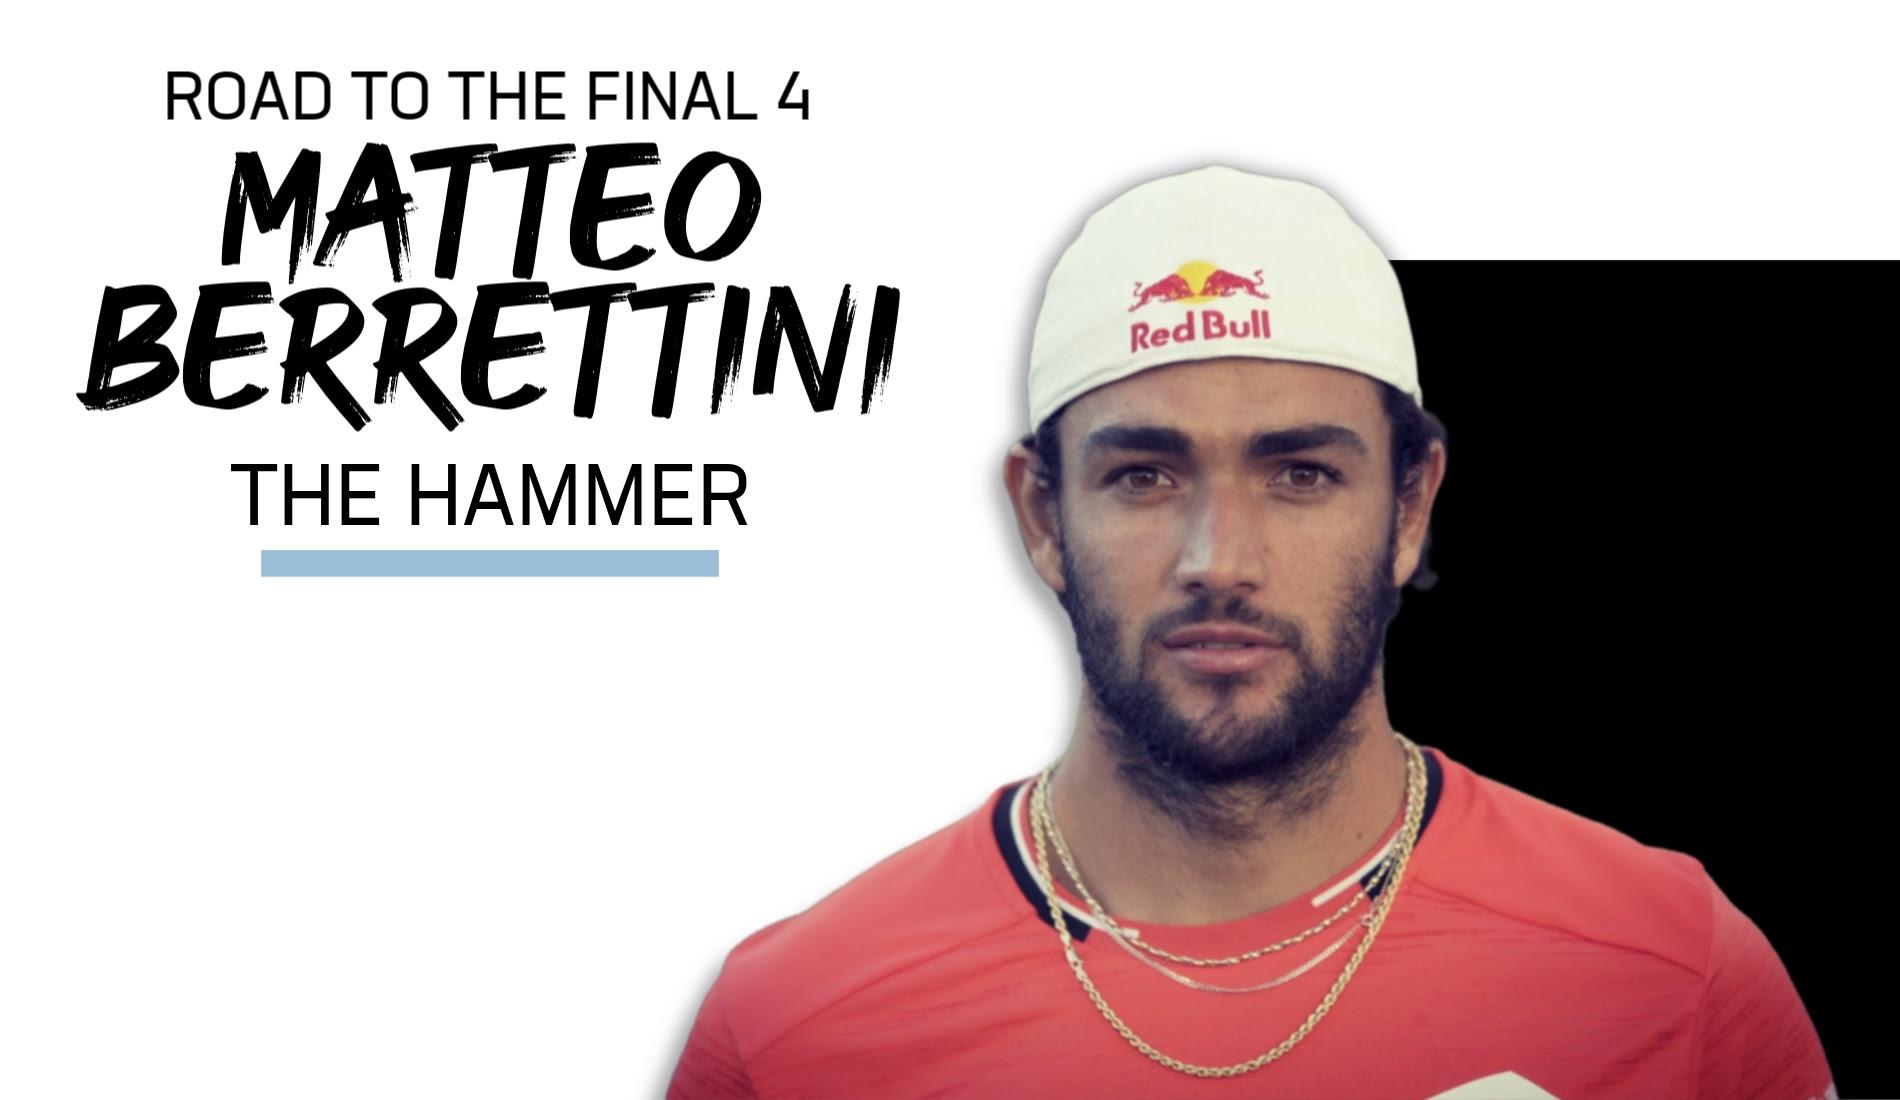 UTS Road to the Final 4: Matteo Berrettini